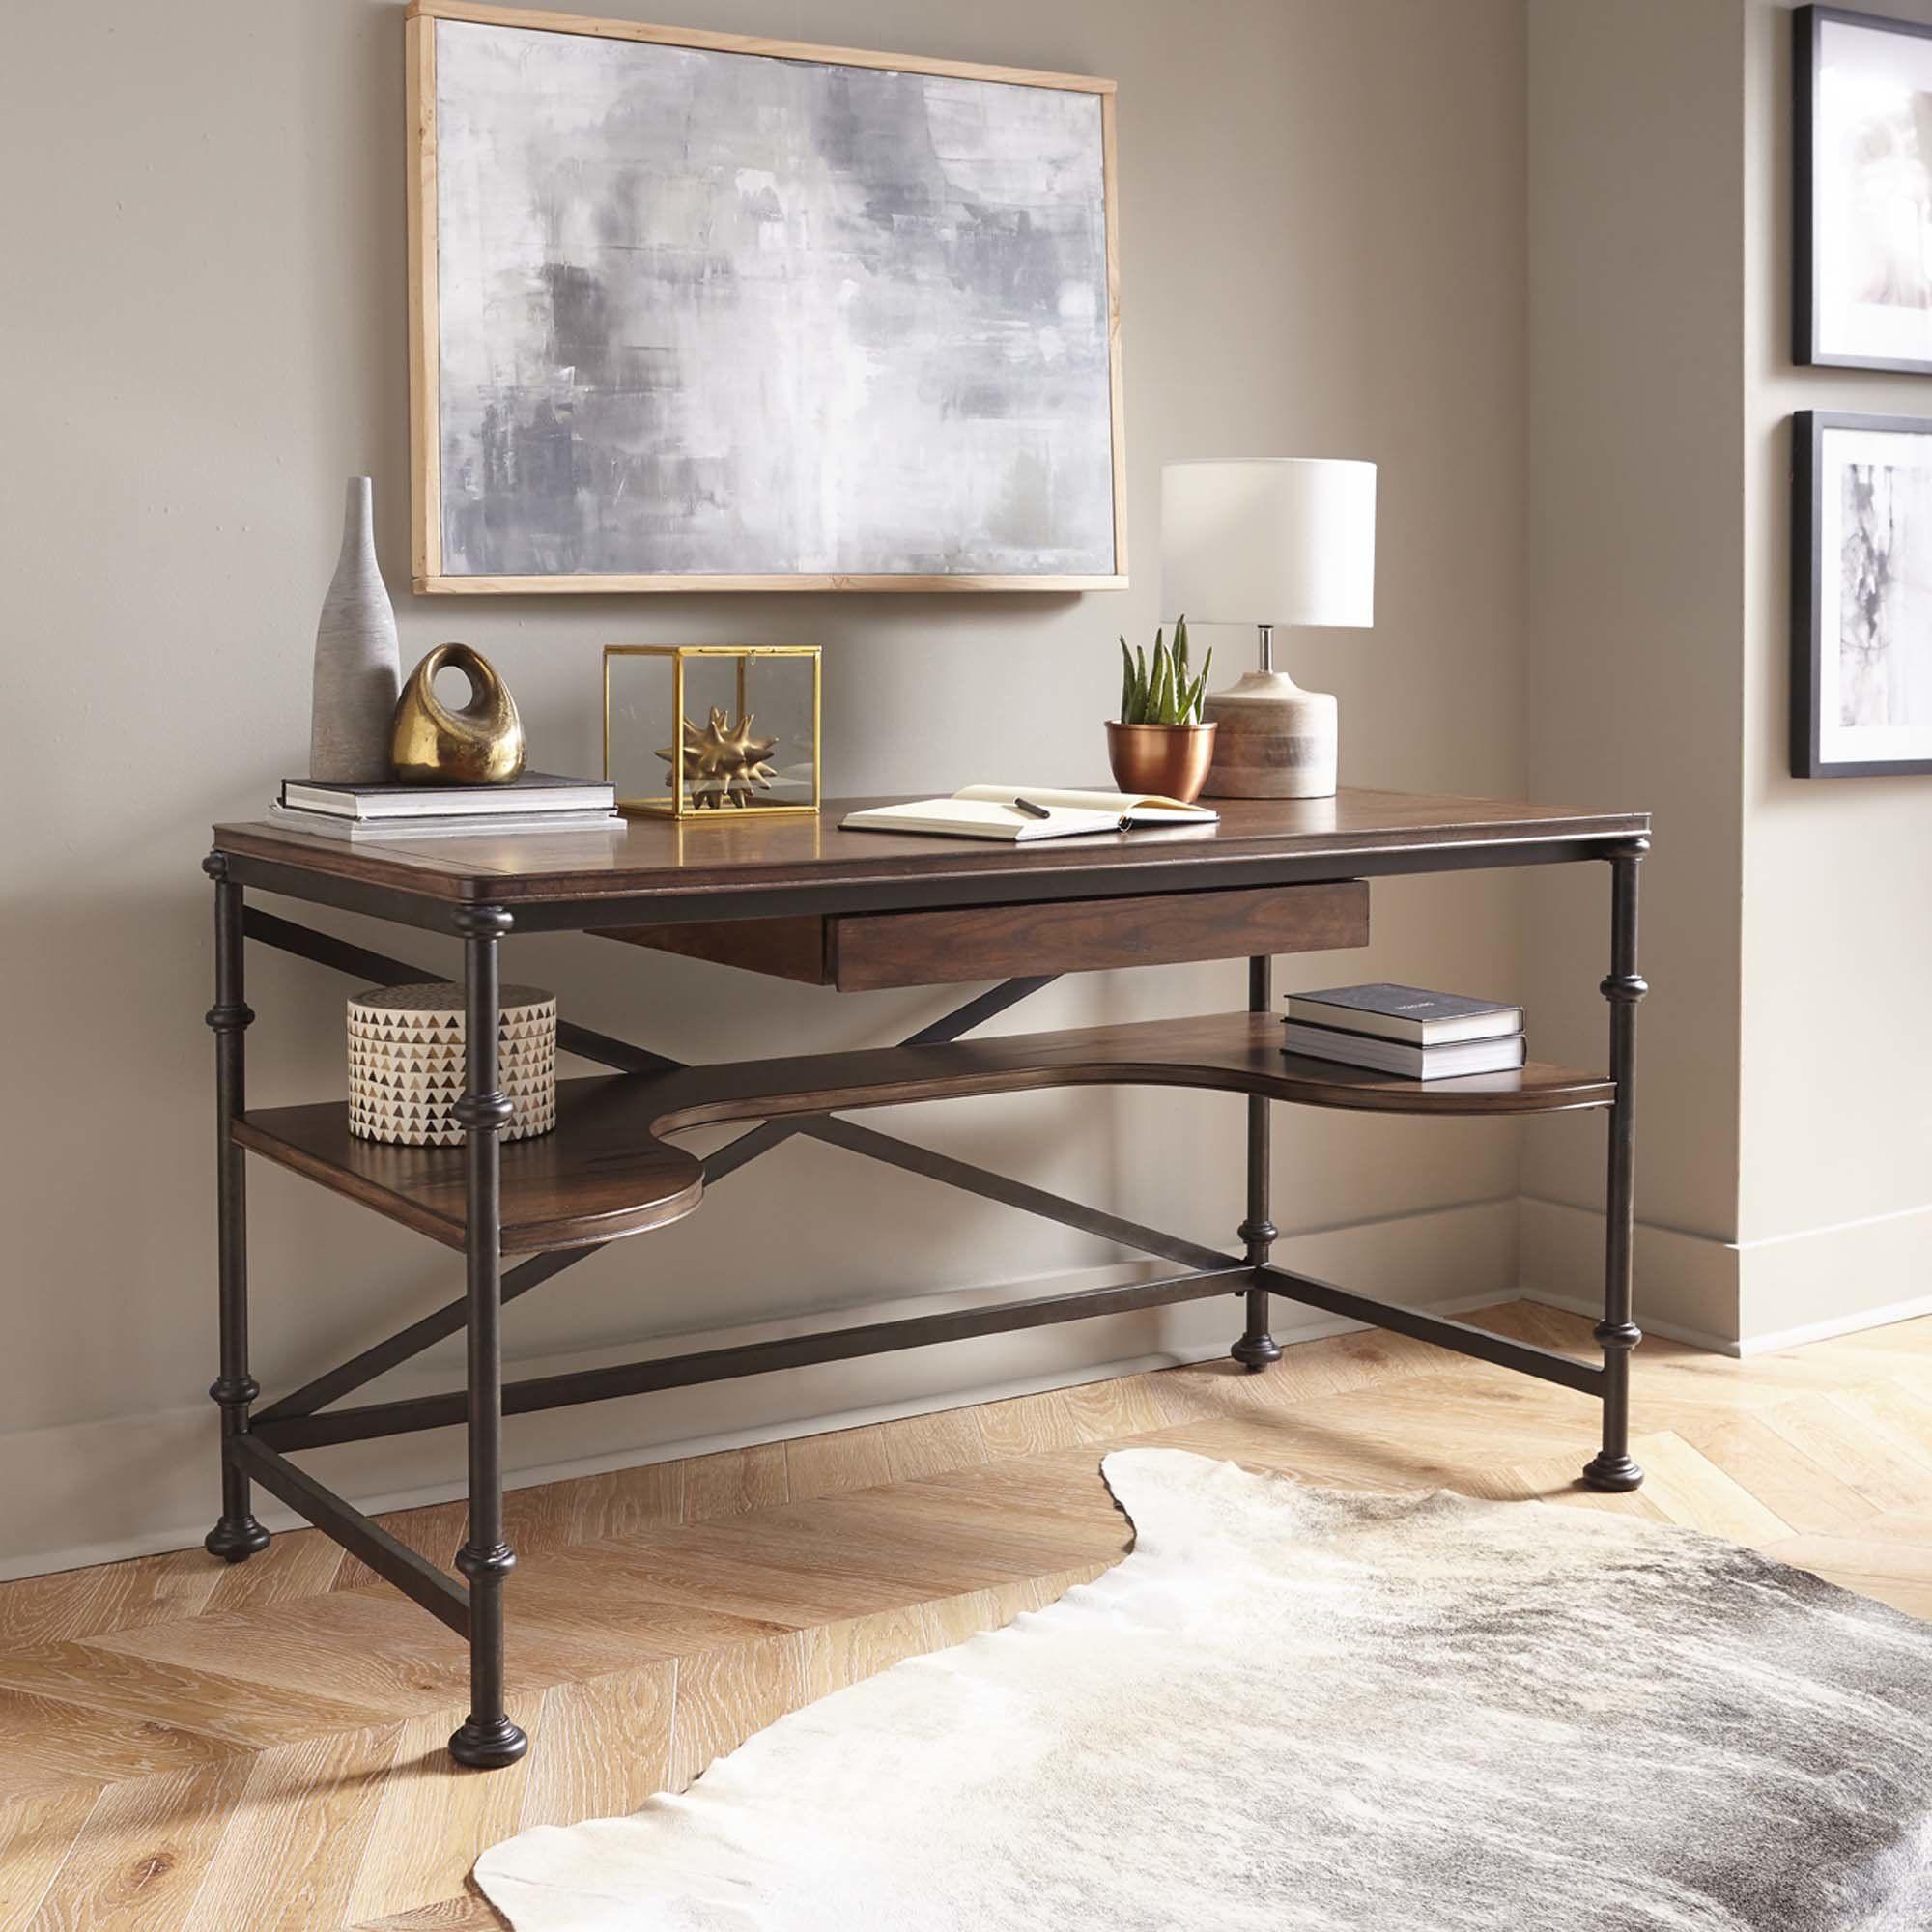 40+ Farmhouse desk with keyboard tray model